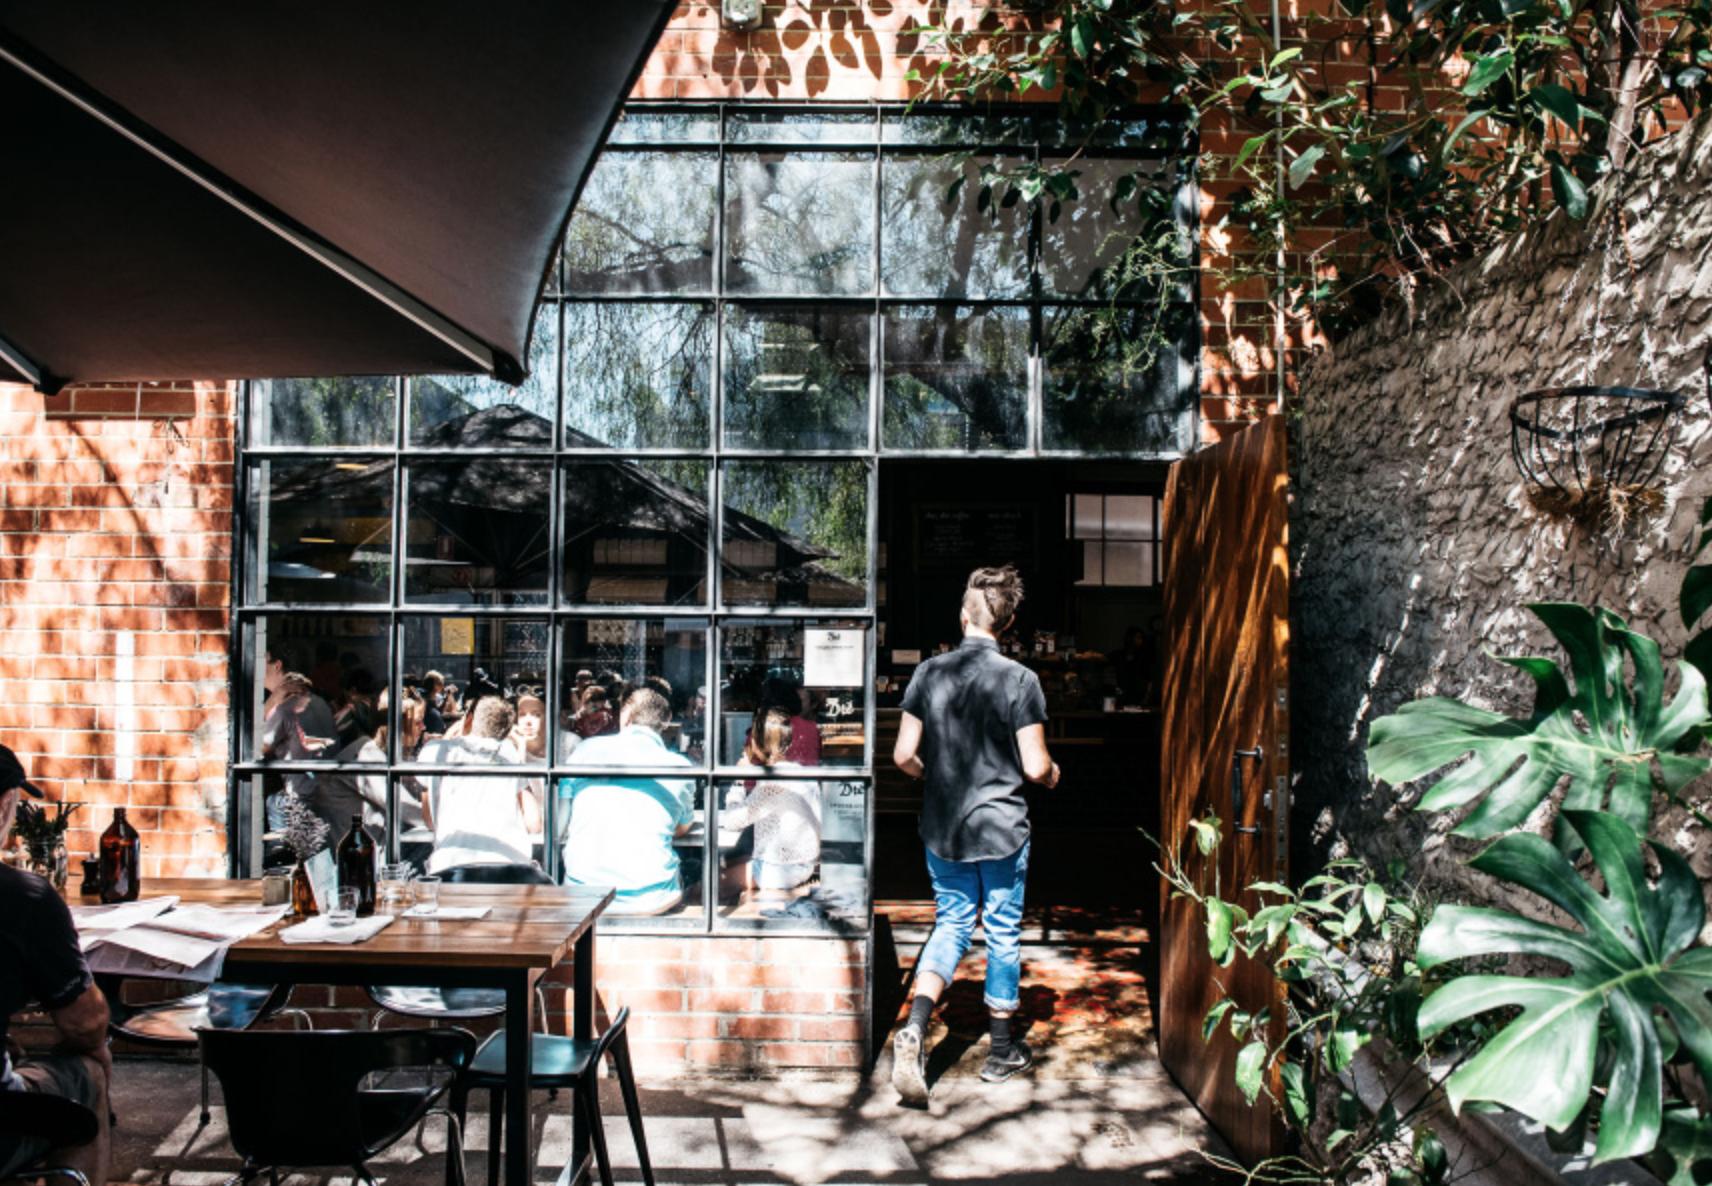 Coffee_Cafe_Design_Outdoor_Space_Interior_Architect_Dublin.jpg